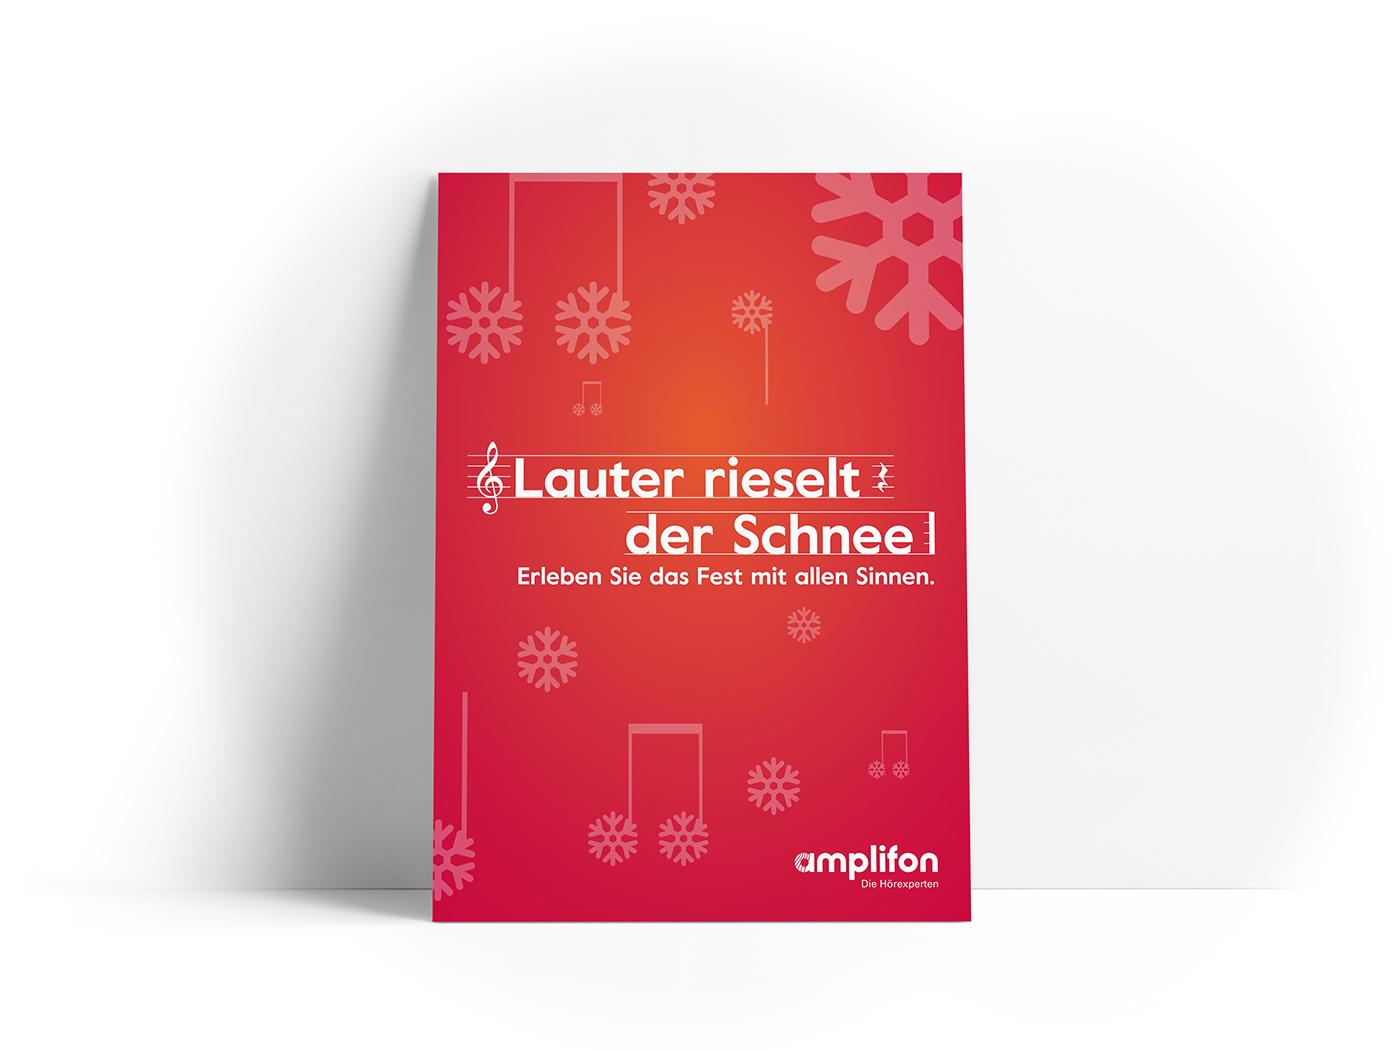 amplifon Weihnachtskampagne 2017 - ZENKER DESIGN